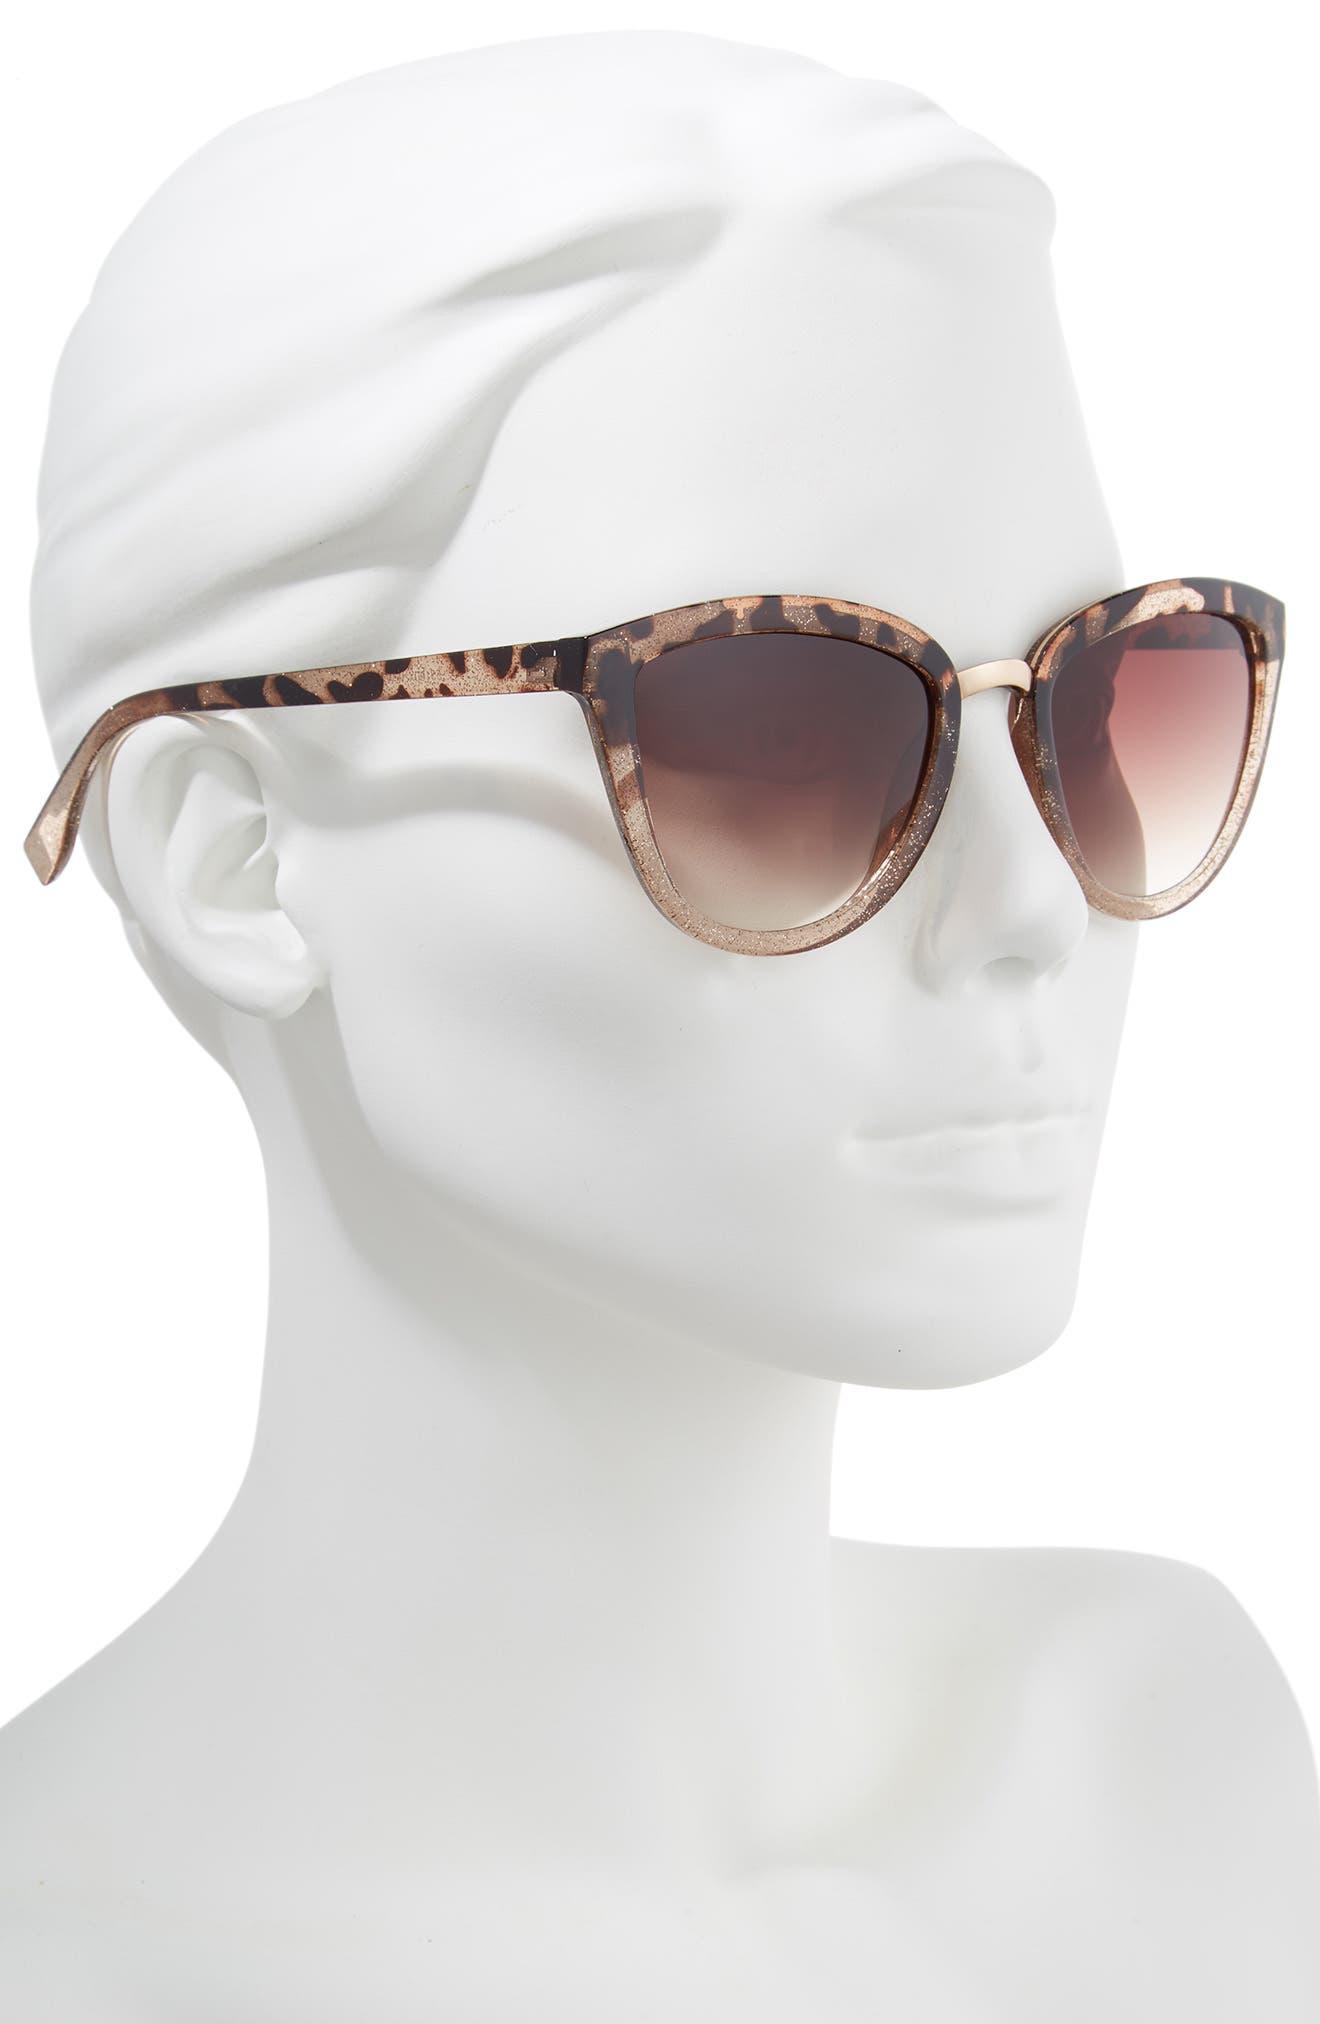 54mm Sparkle Cat Eye Sunglasses,                             Alternate thumbnail 2, color,                             Tort